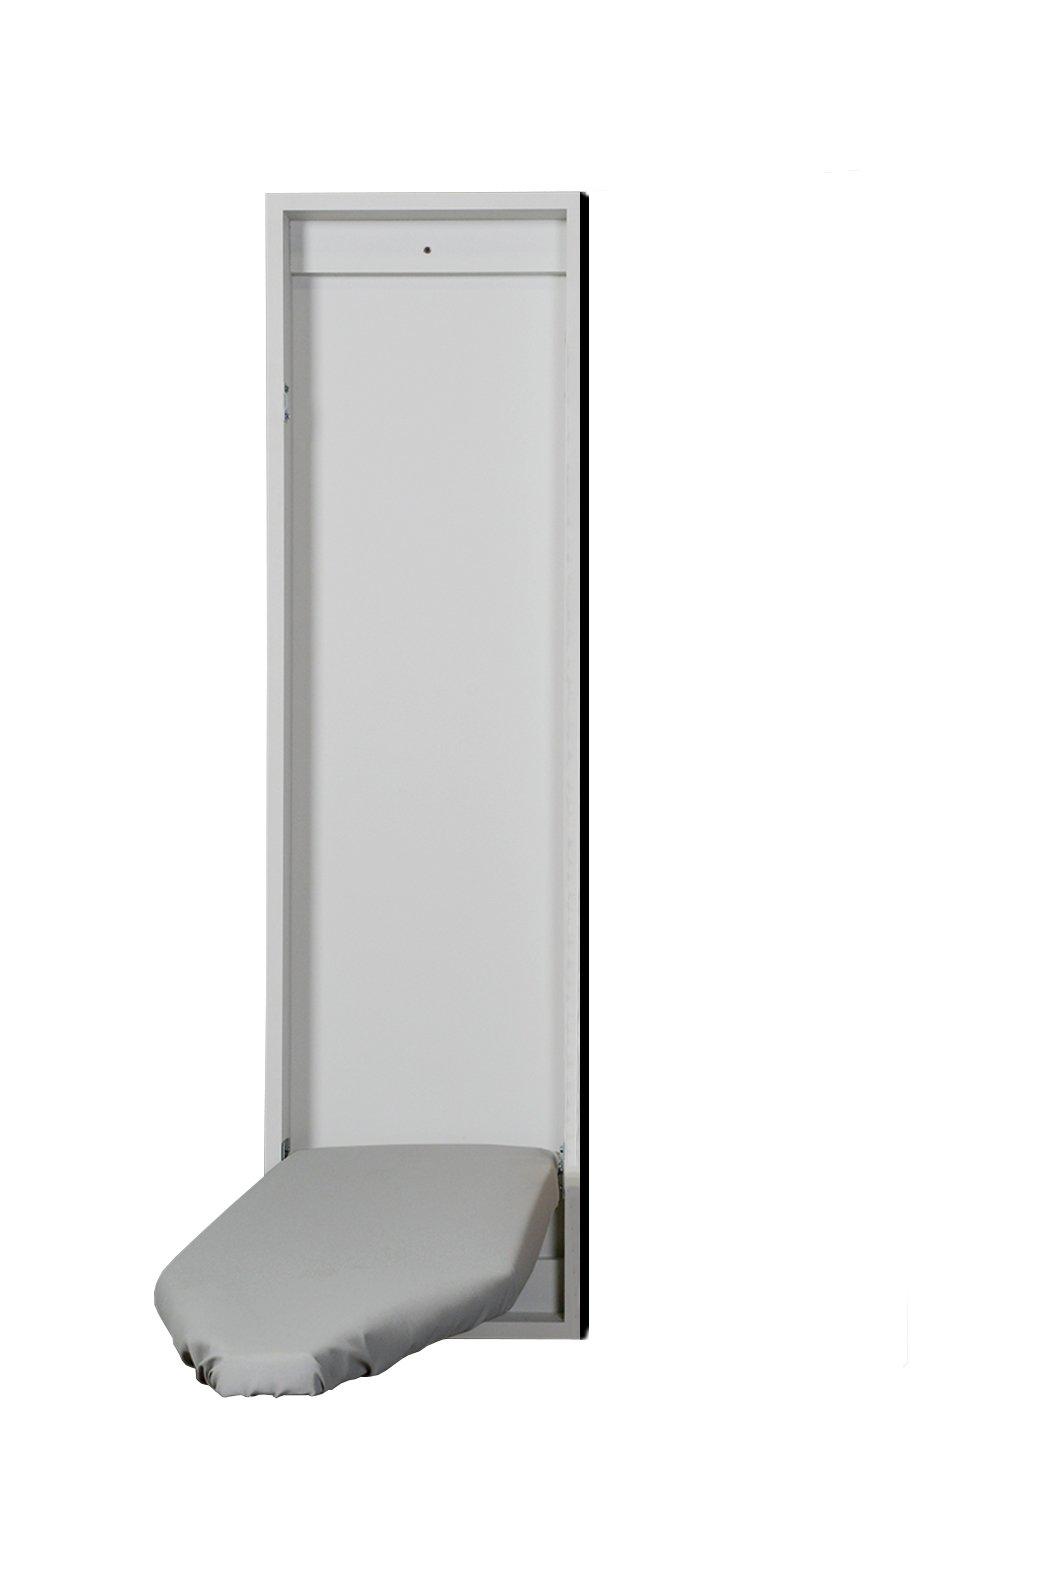 Iron-A-Way Economy Surface Or Flush Mount Ironing Center, No Door